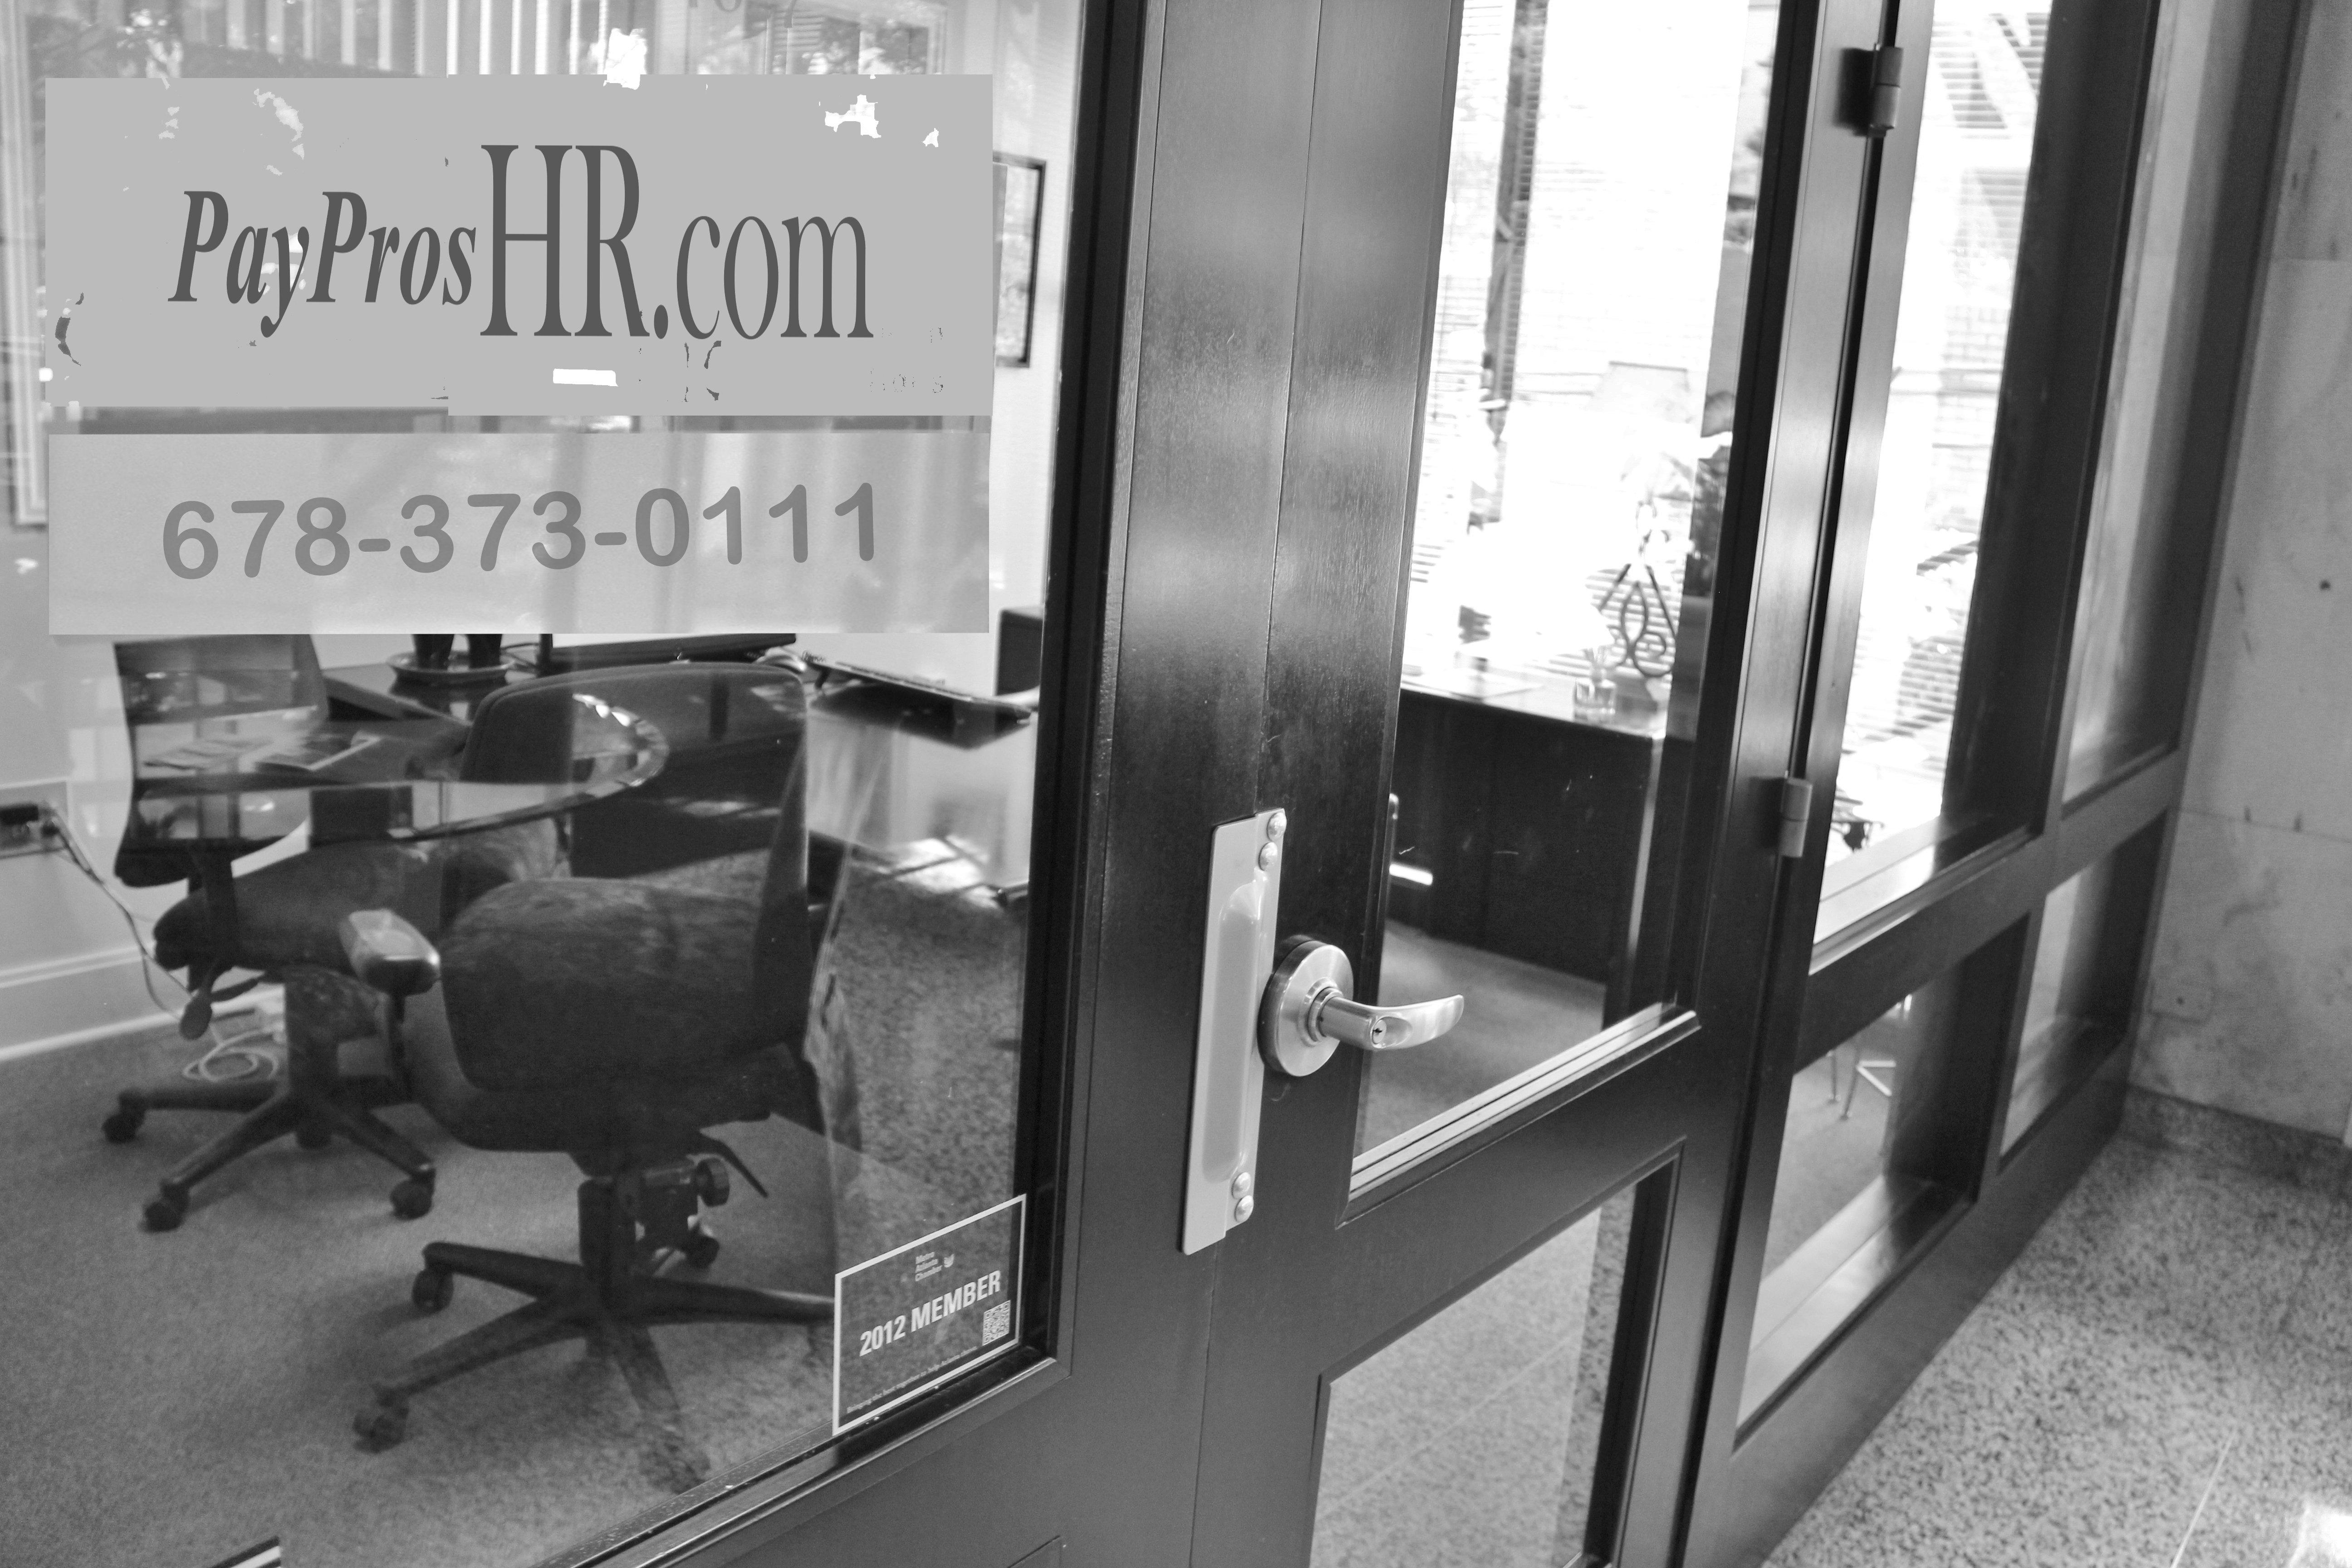 Paypros HR office